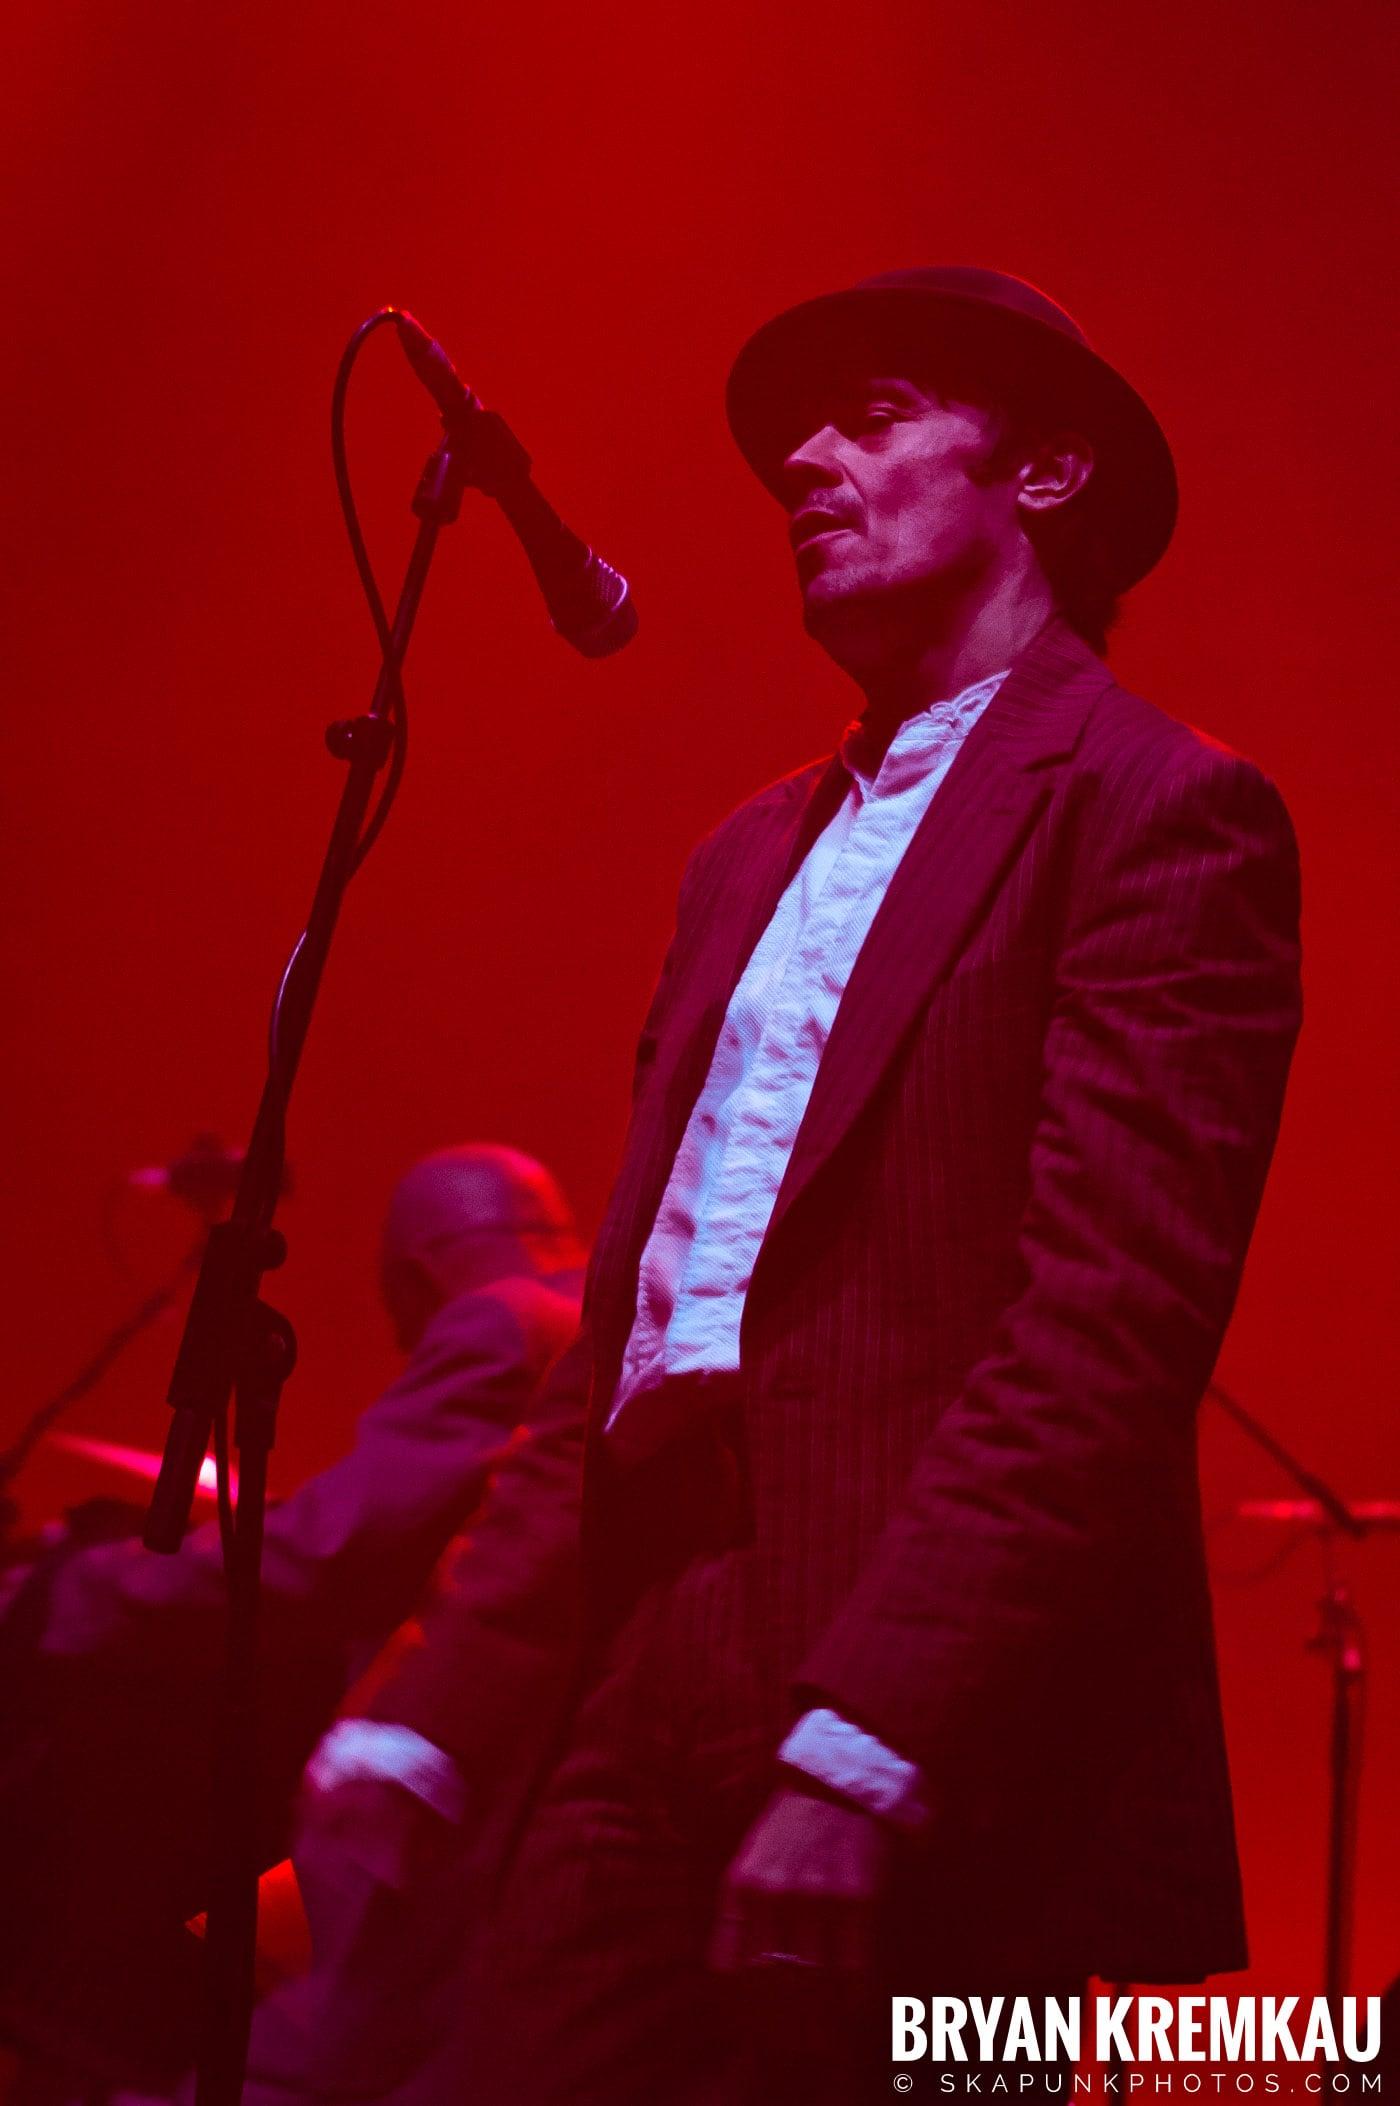 The Pogues @ Brixton Academy, London UK - 12.17.06 (4)